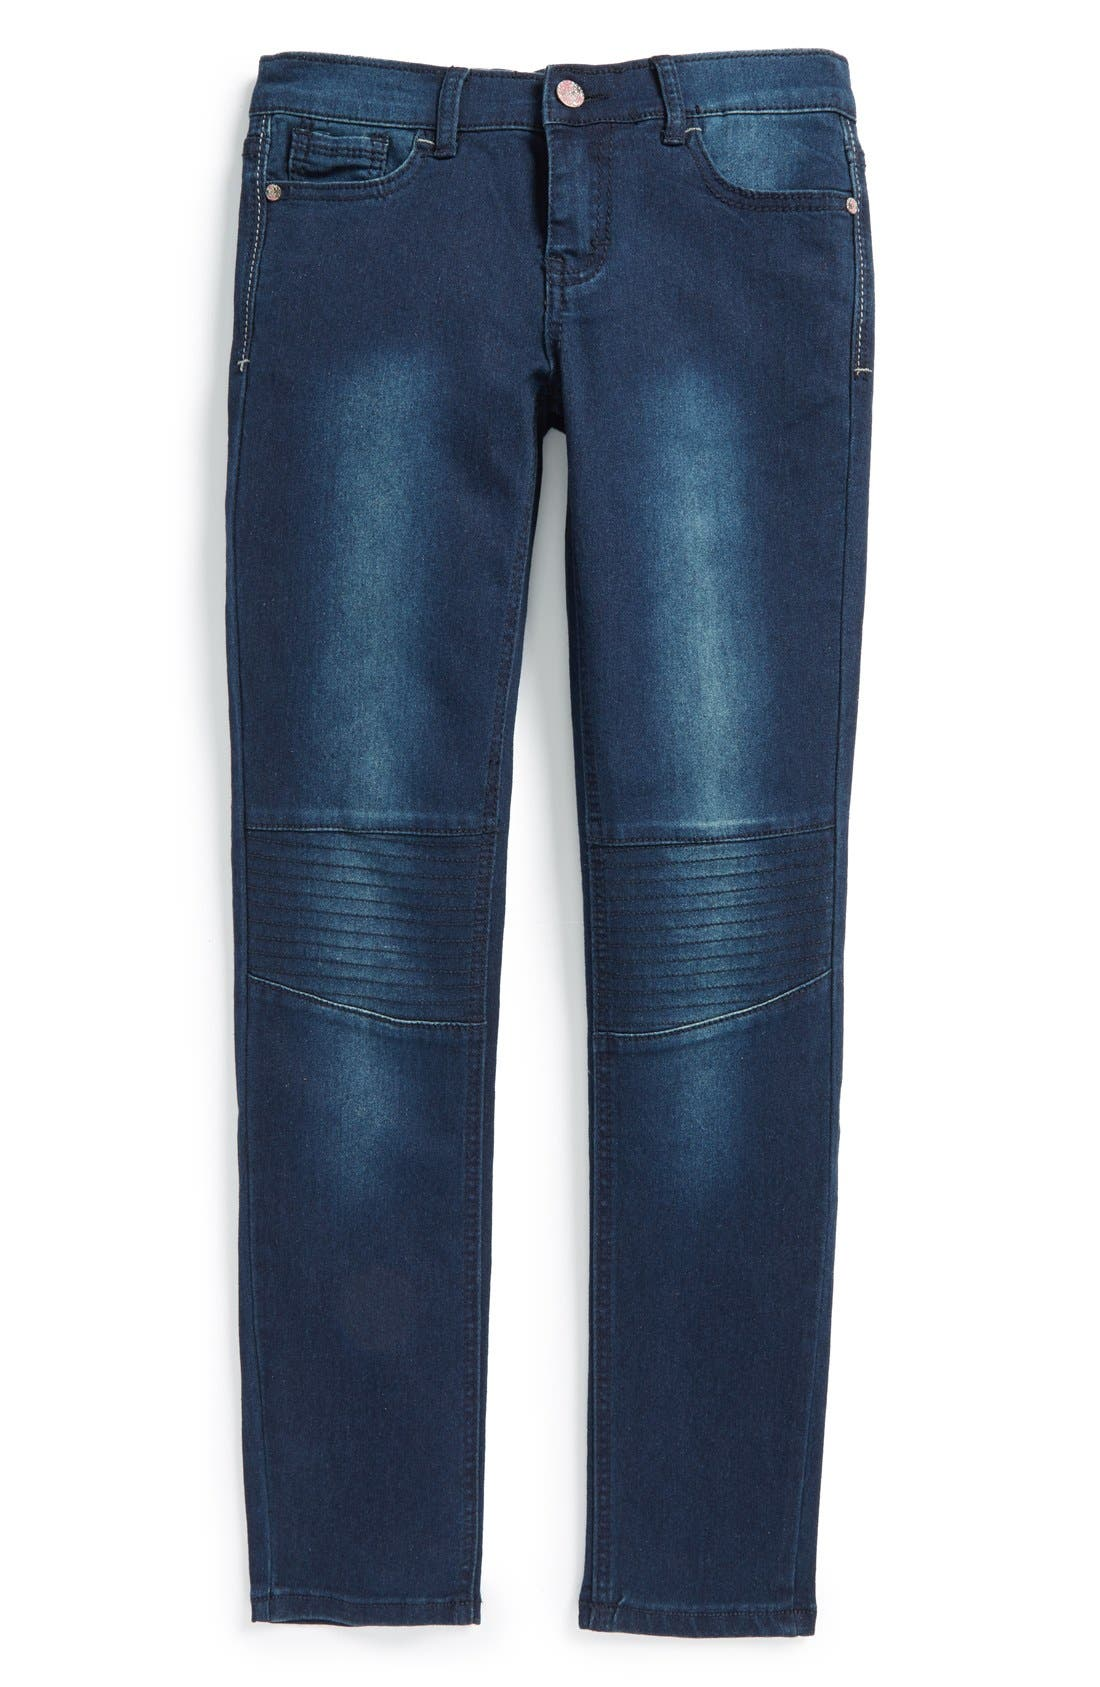 Alternate Image 1 Selected - Vigoss Moto Skinny Jeans (Big Girls)